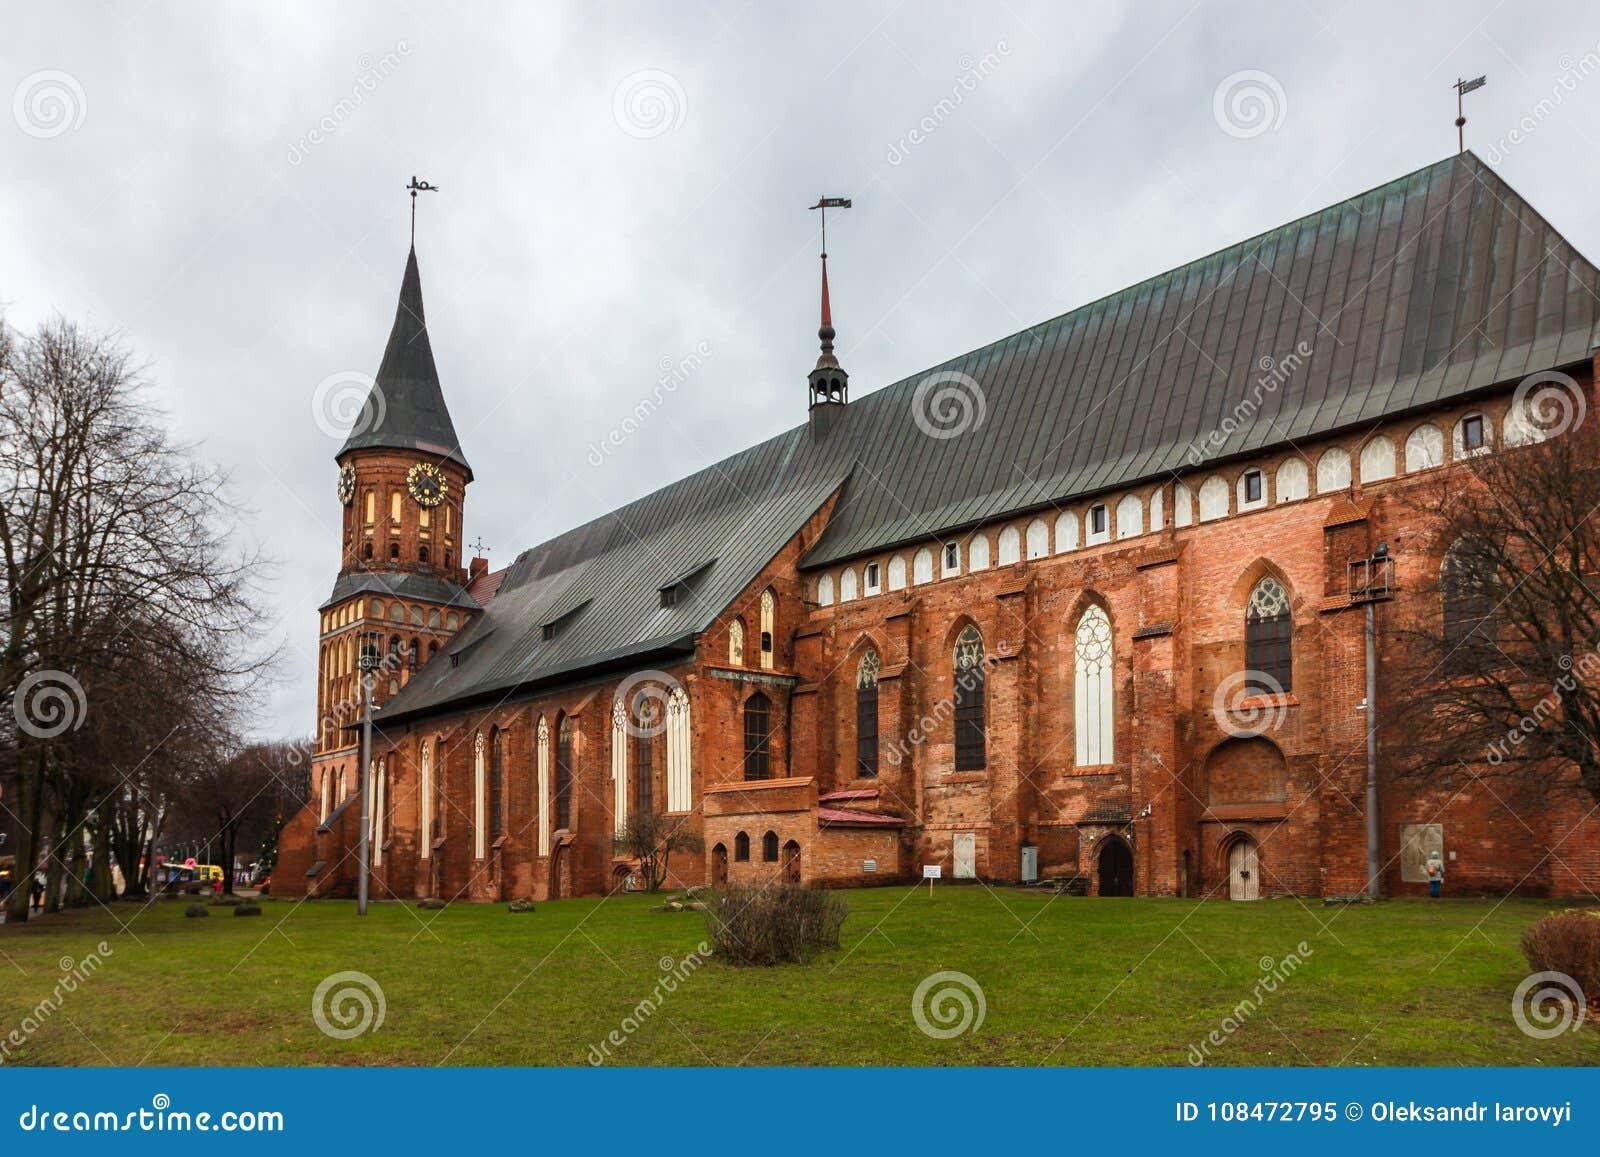 Kaliningrad, Fédération de Russie - 4 janvier 2018 : Kant Museum